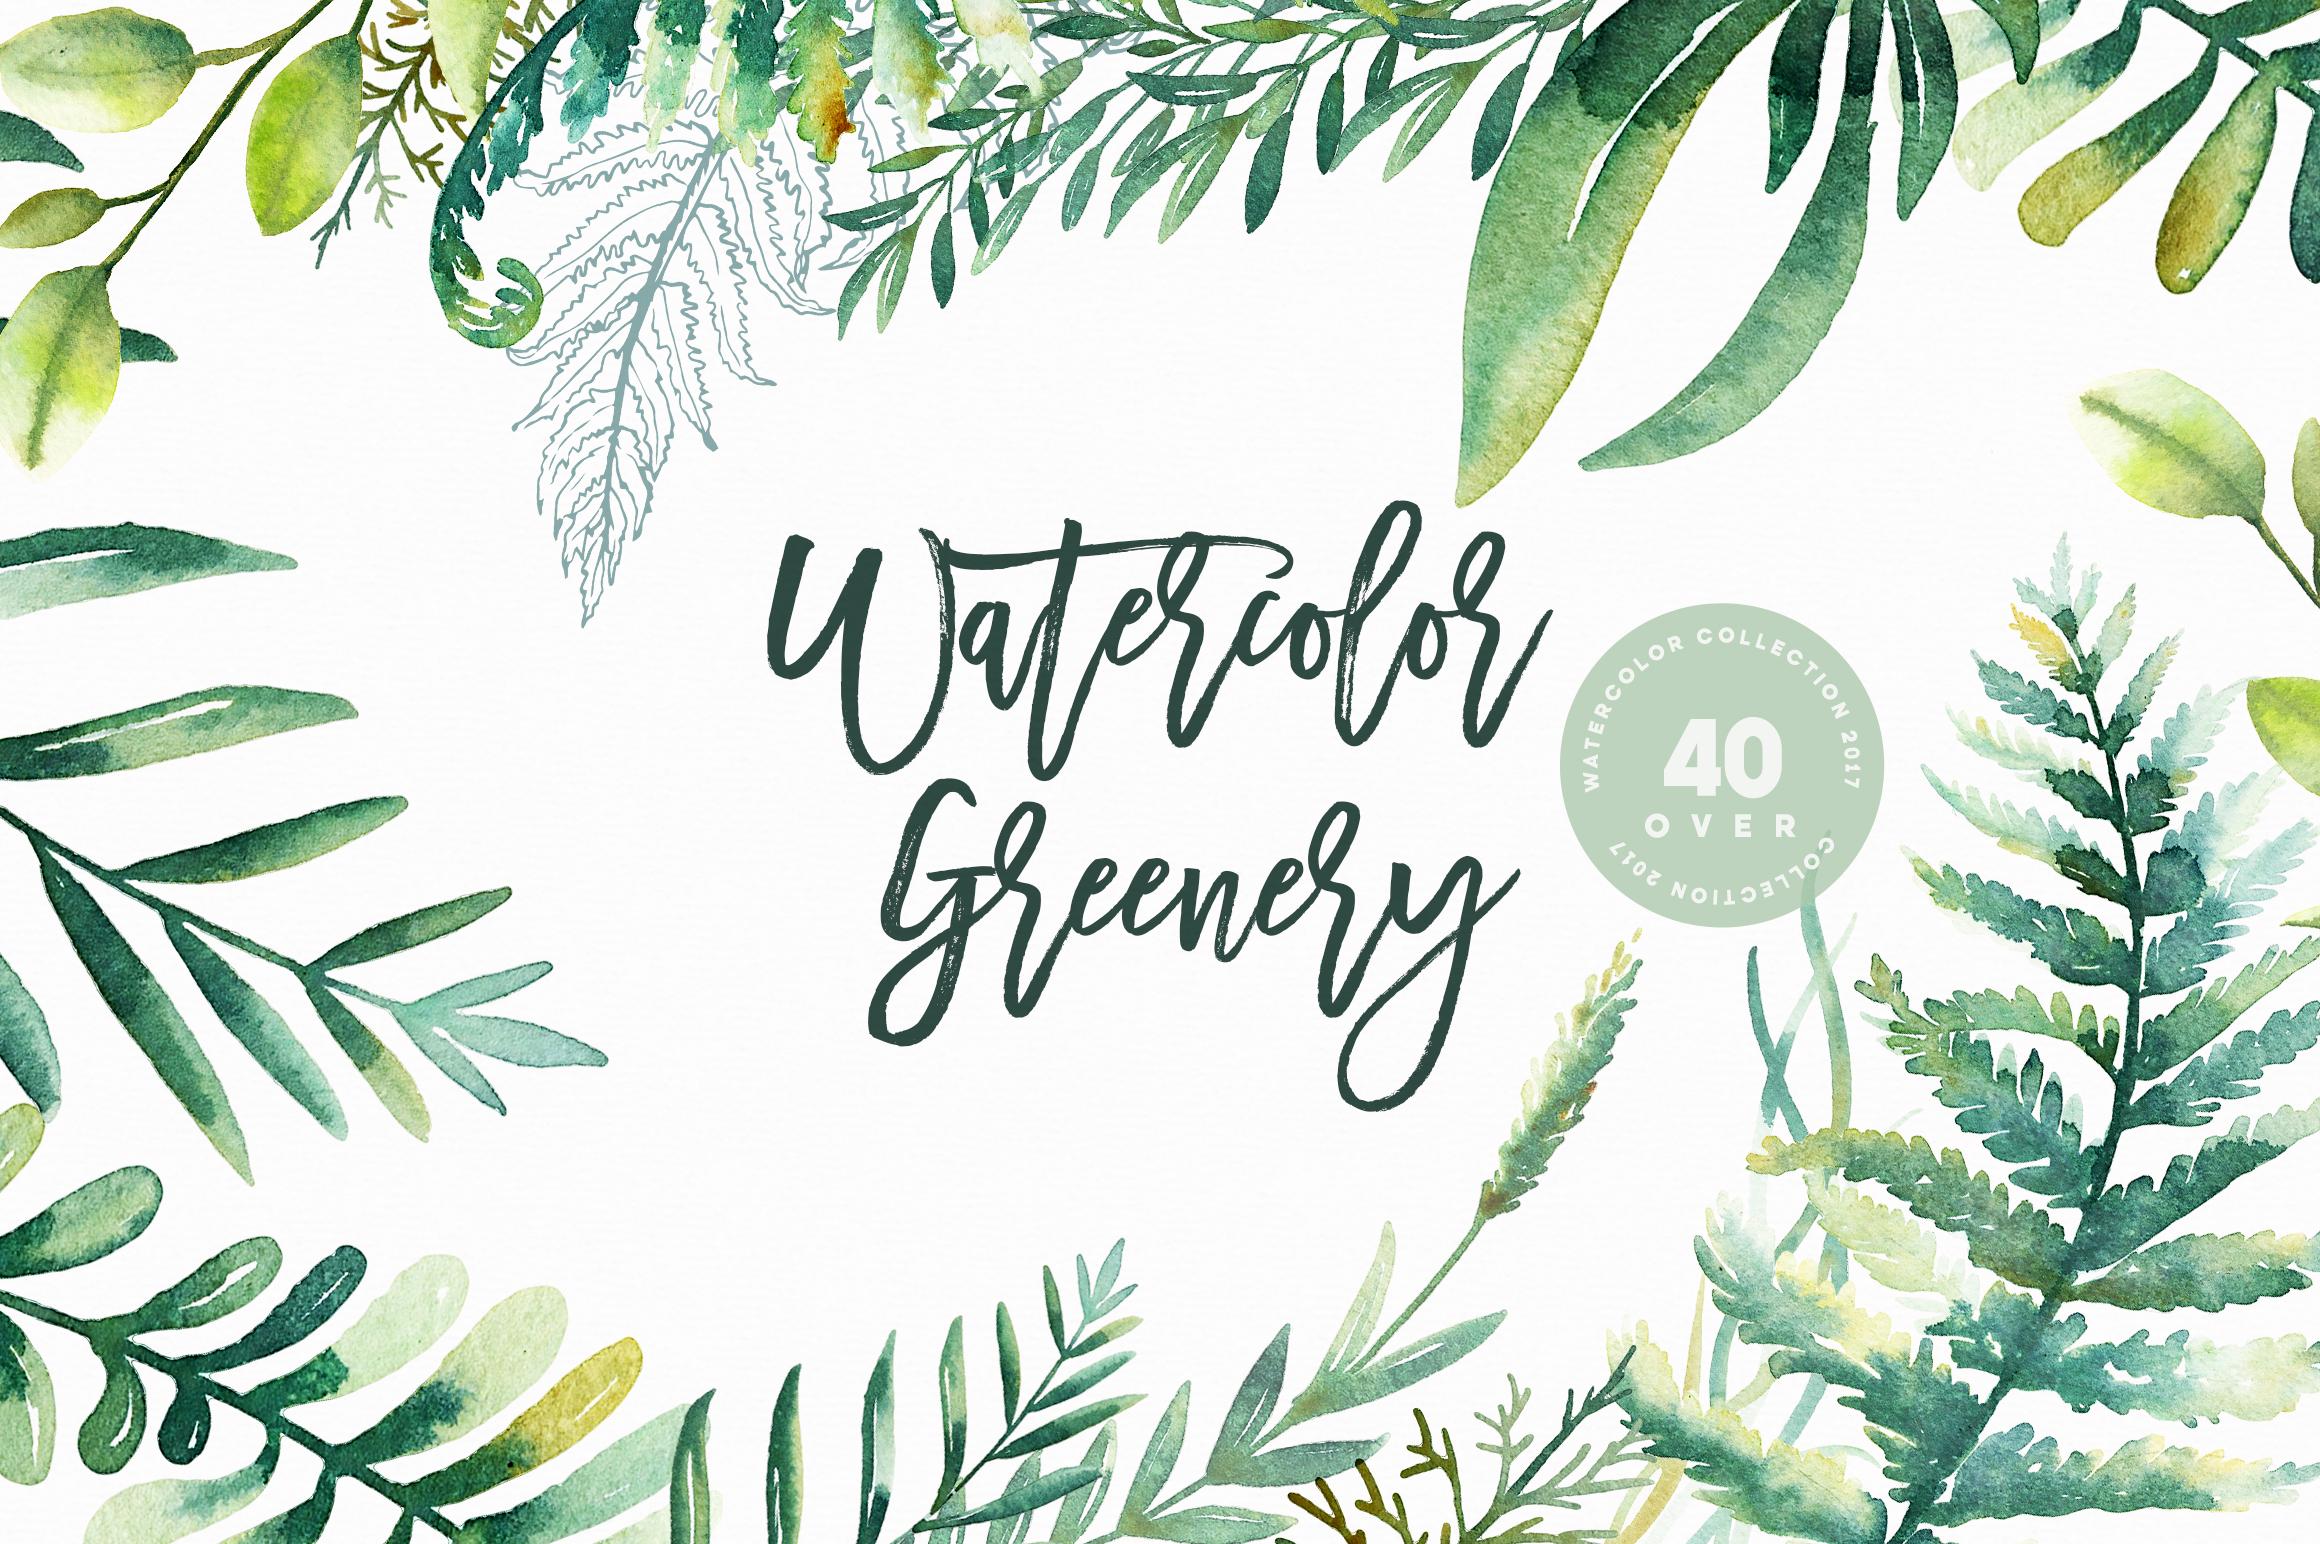 Watercolor Greenery example image 1